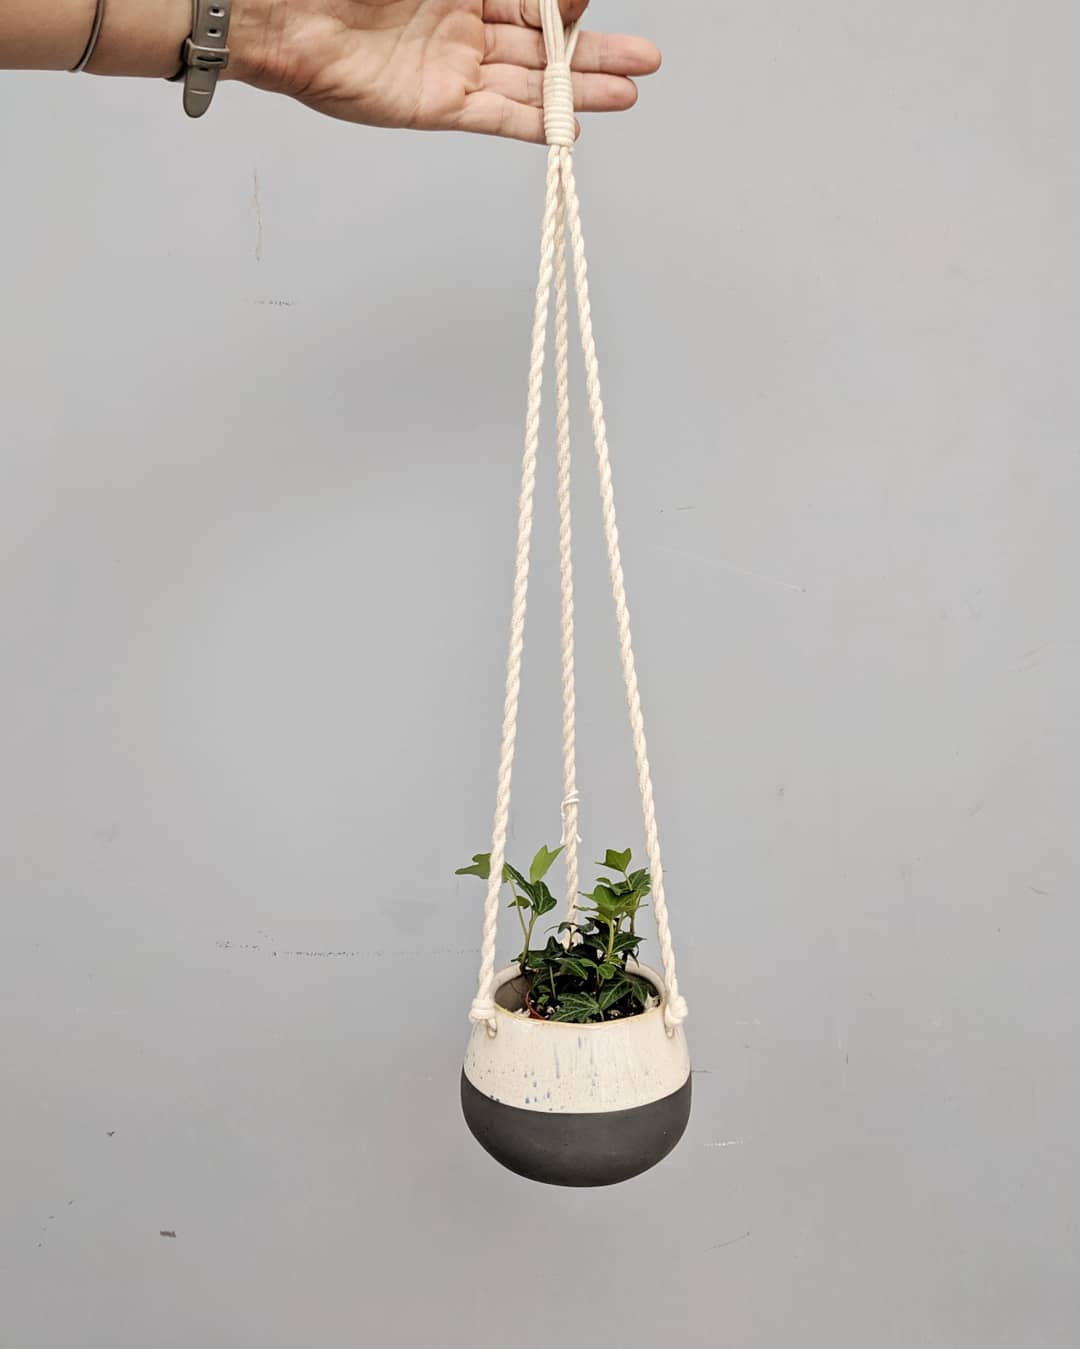 Small terrarium ivy in a modern ceramic hanging pot